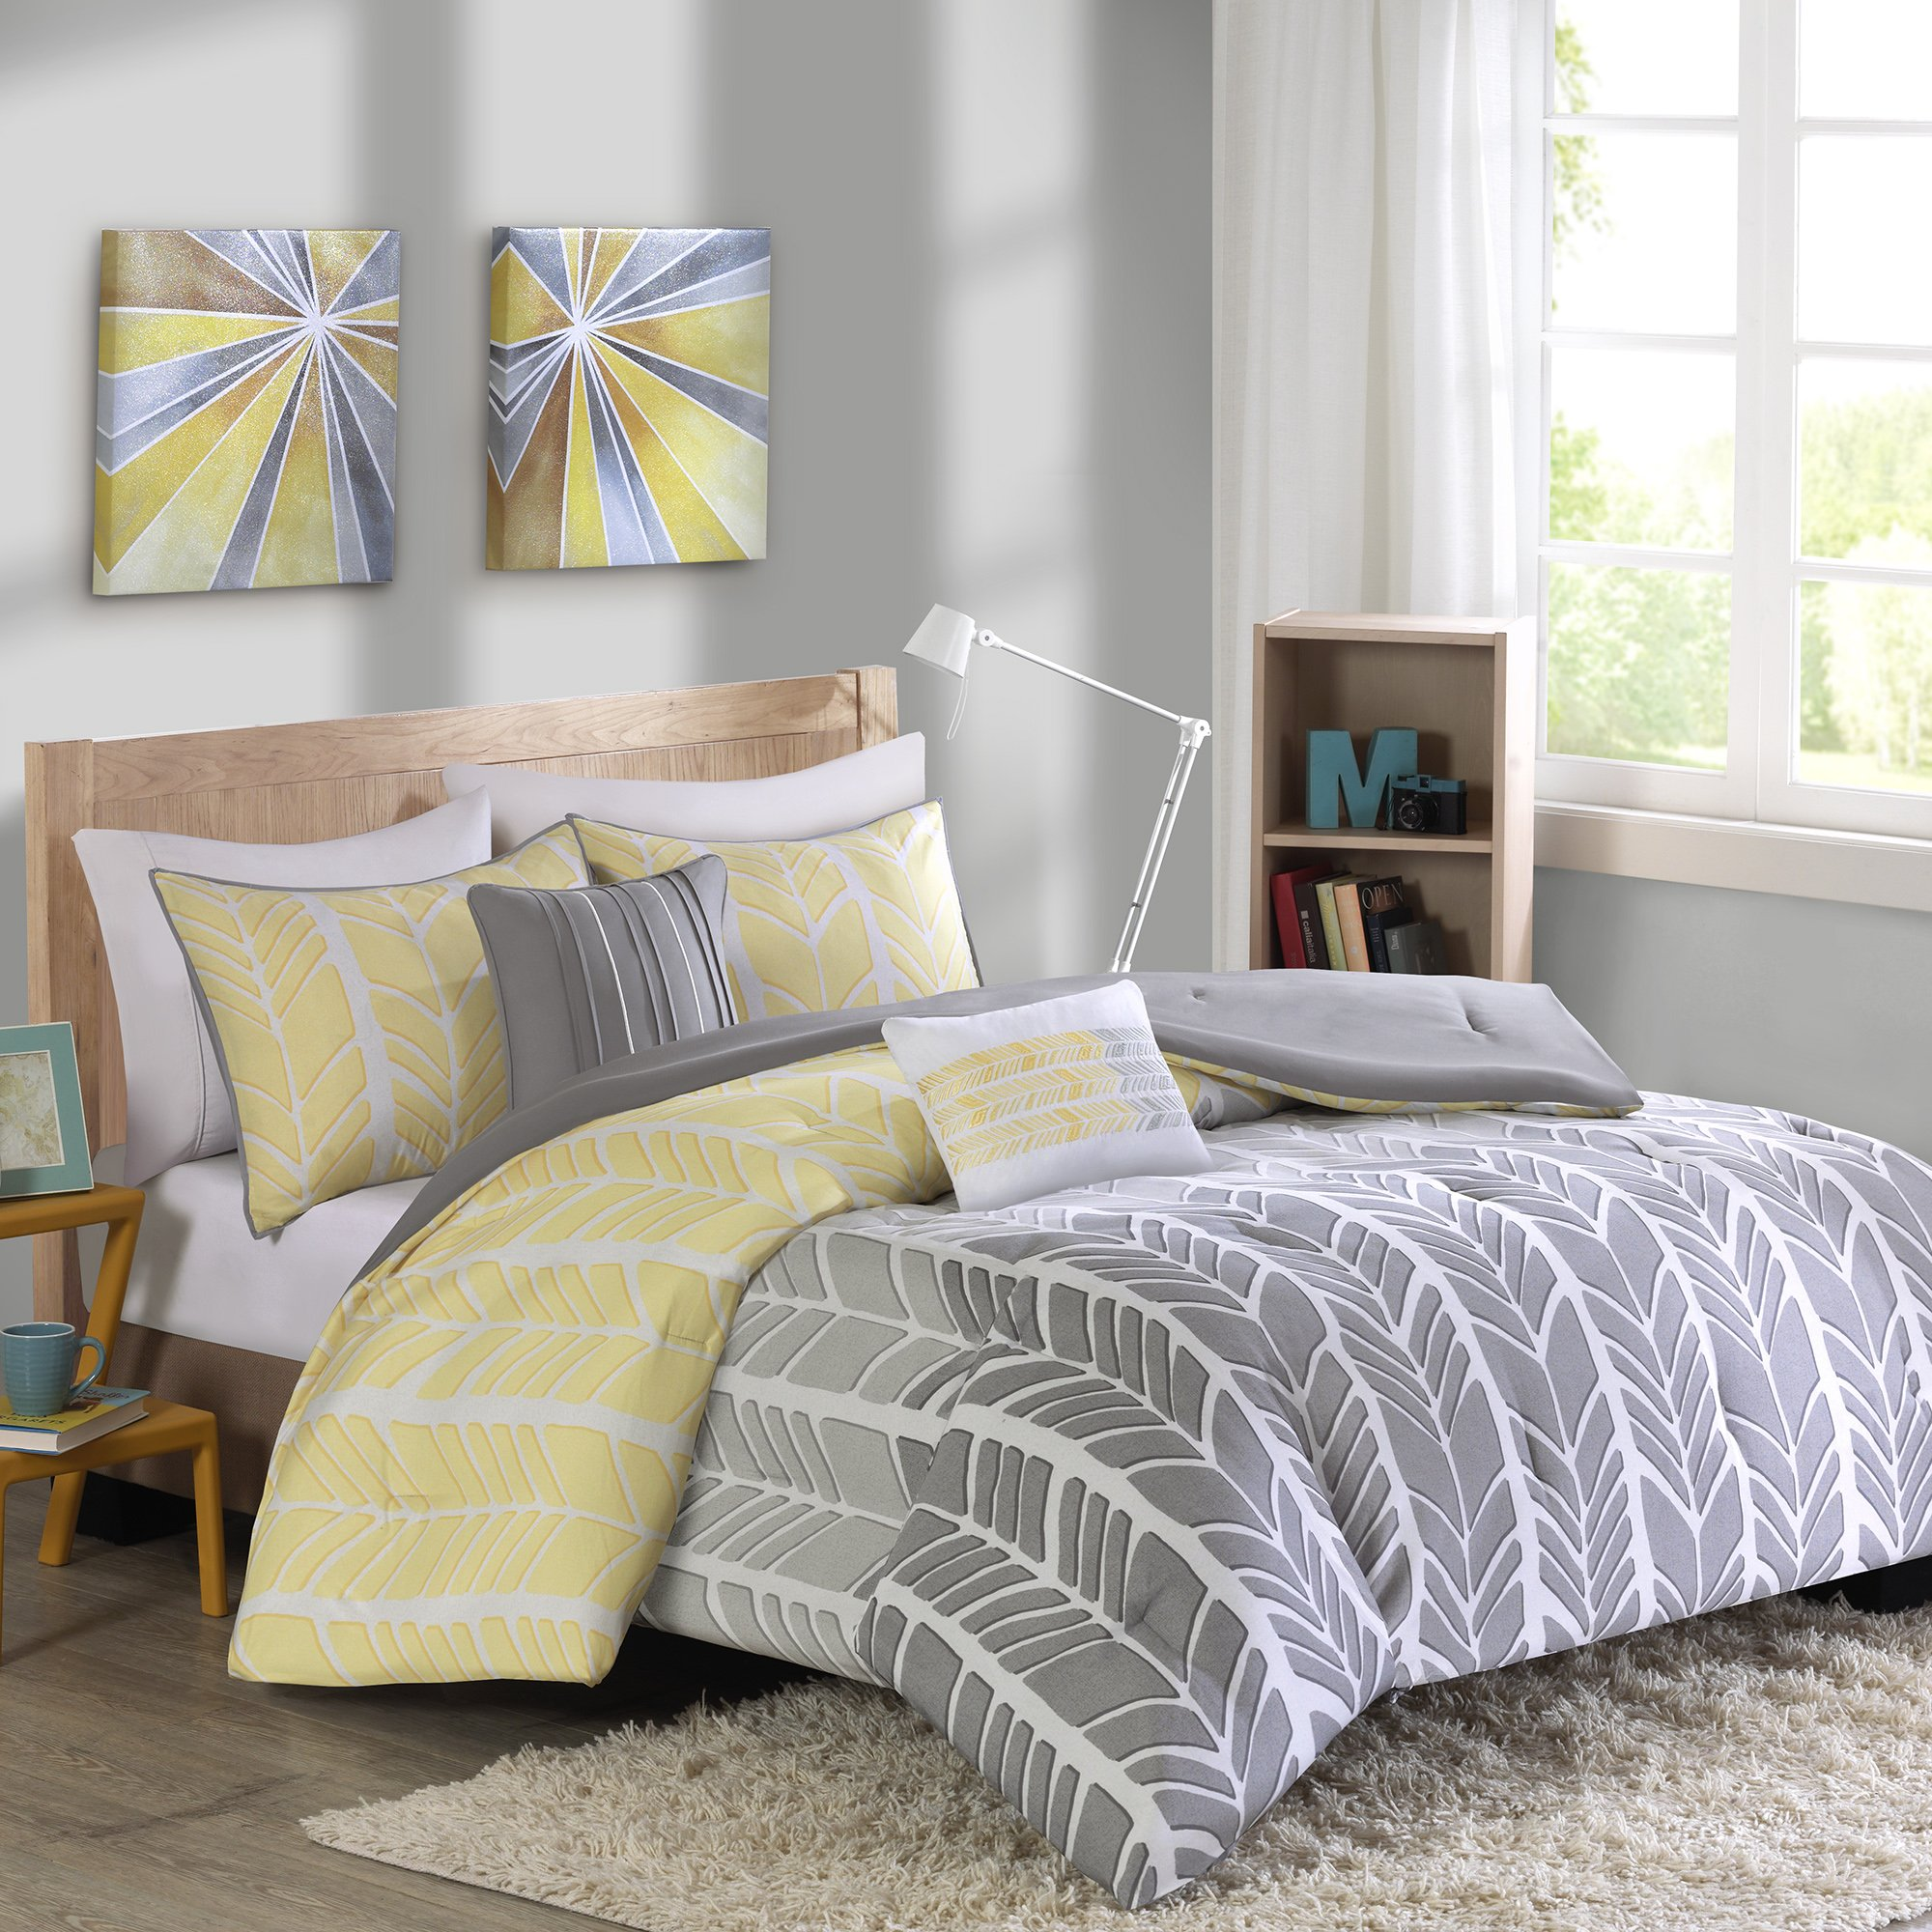 Intelligent Design Adel Comforter Set Full/Queen Size - Yellow, Light Grey, Grey, Geometric Chevron – 5 Piece Bed Sets – Ultra Soft Microfiber Teen Bedding for Girls Bedroom